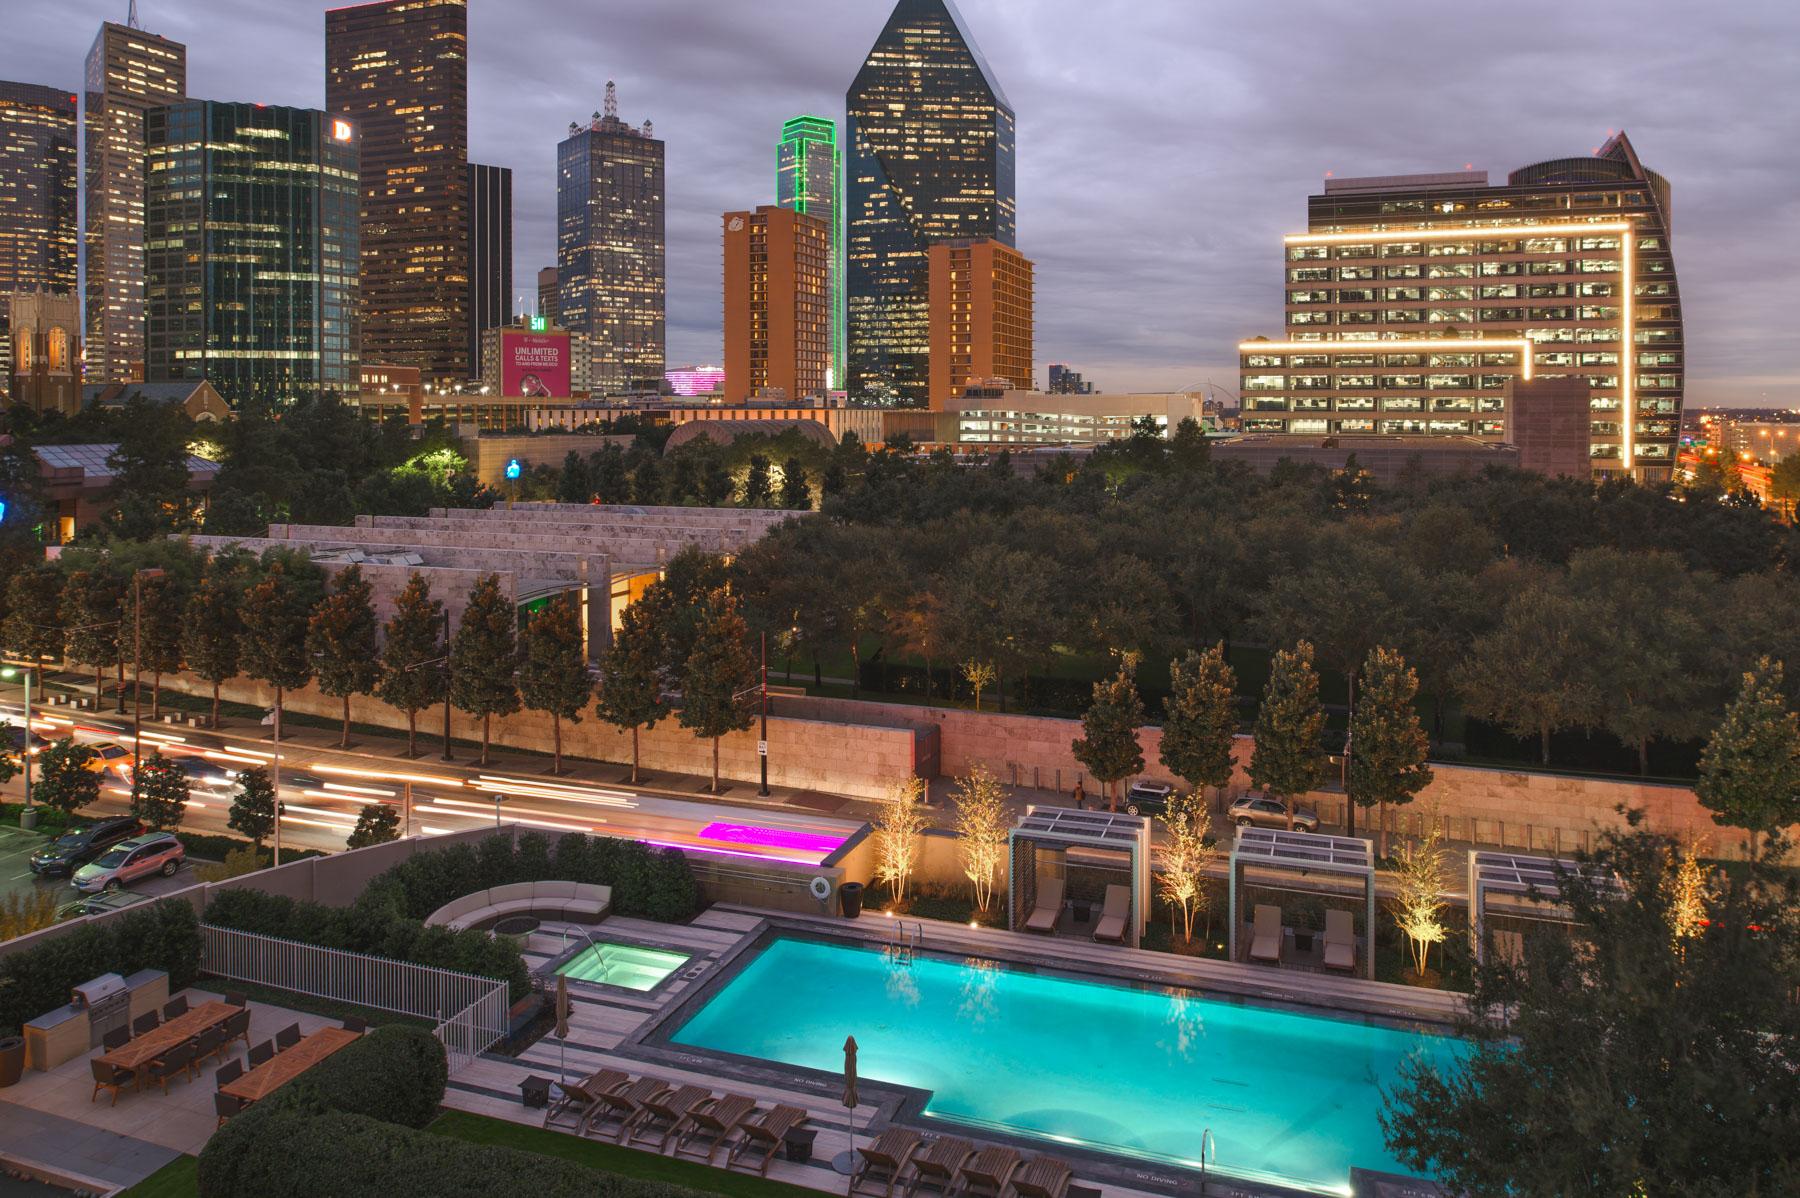 Nhà chung cư vì Bán tại Museum Tower Condominium 1918 N Olive St 403 Dallas, Texas, 75201 Hoa Kỳ